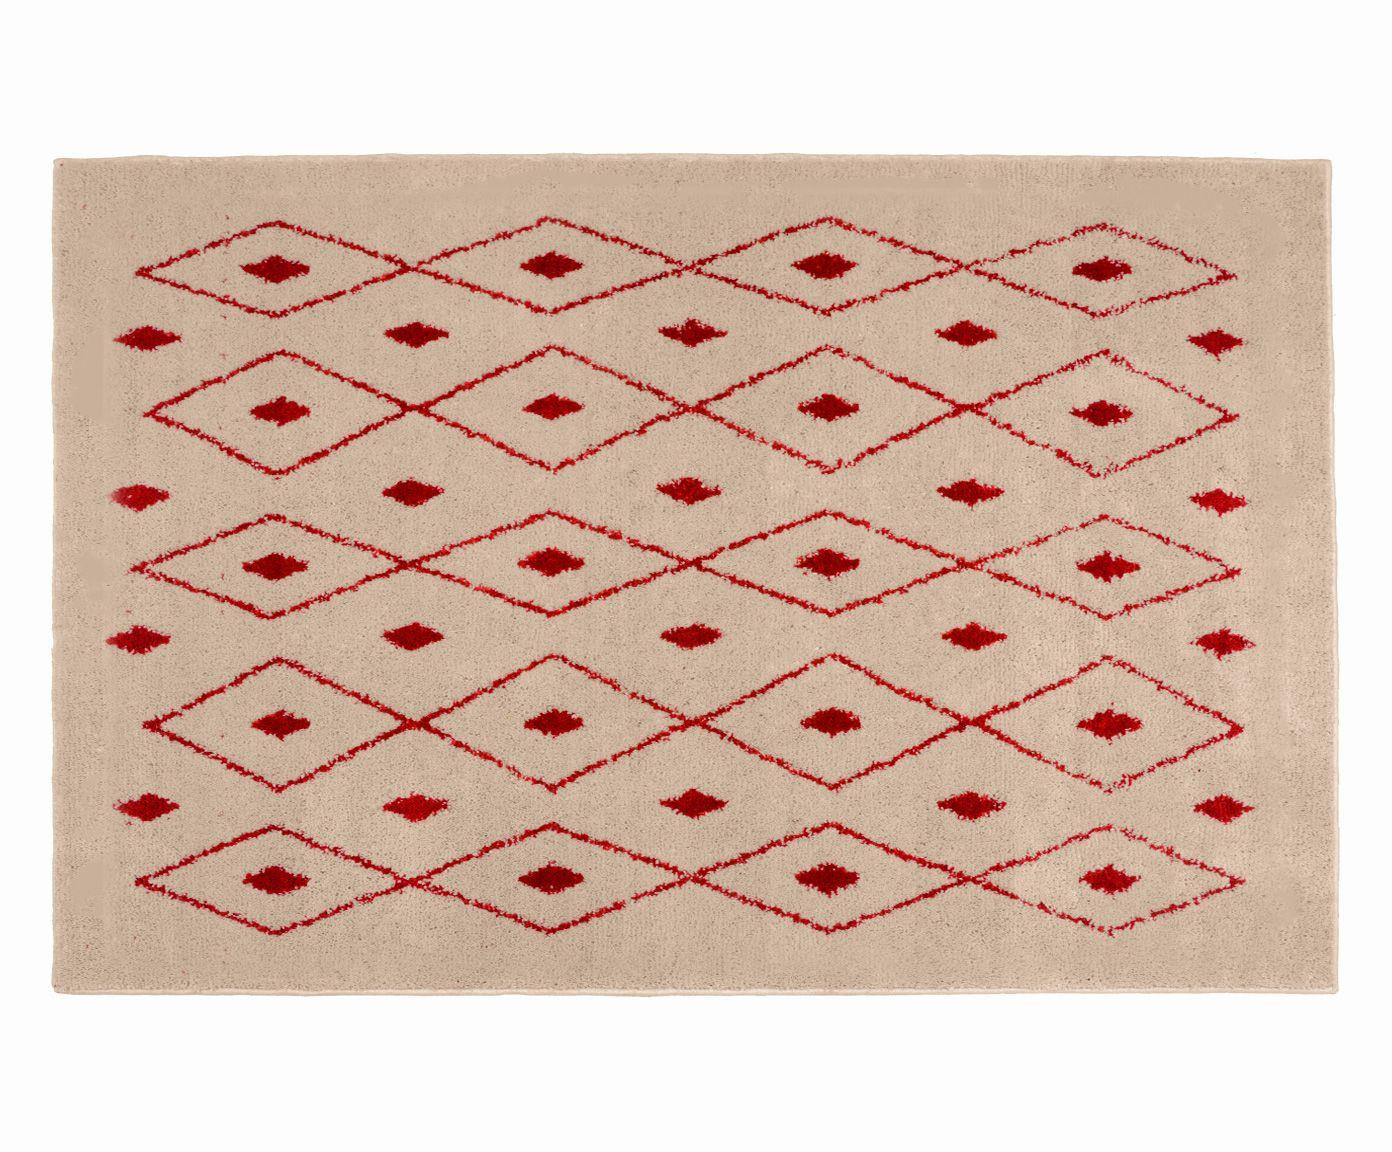 Tapete Art Kahina Pérola e Rubi - 150X200cm, 150x200cm | Westwing.com.br